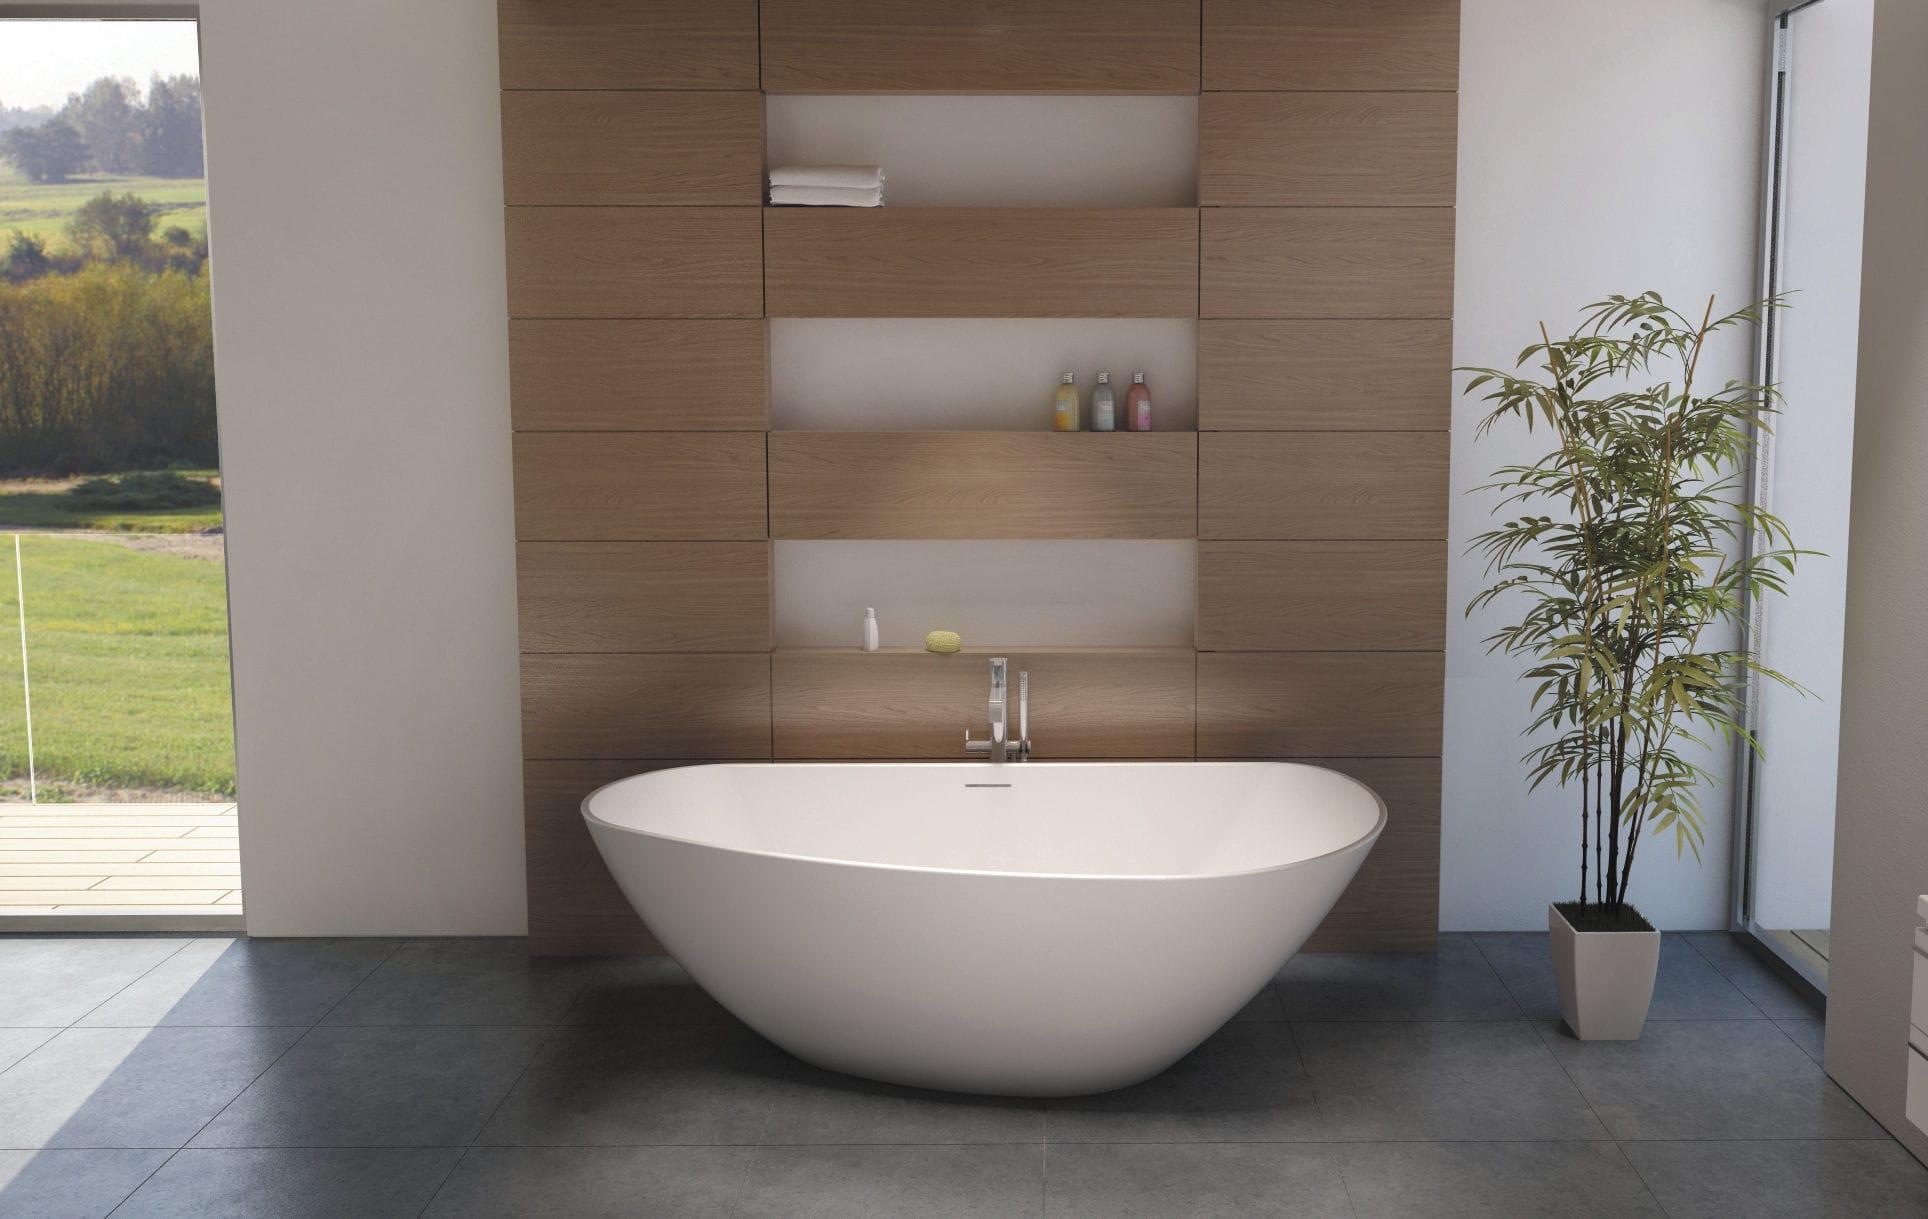 Vasca Da Bagno Incasso 160x70 : Vasche da bagno prodotti prezzi e offerte desivero